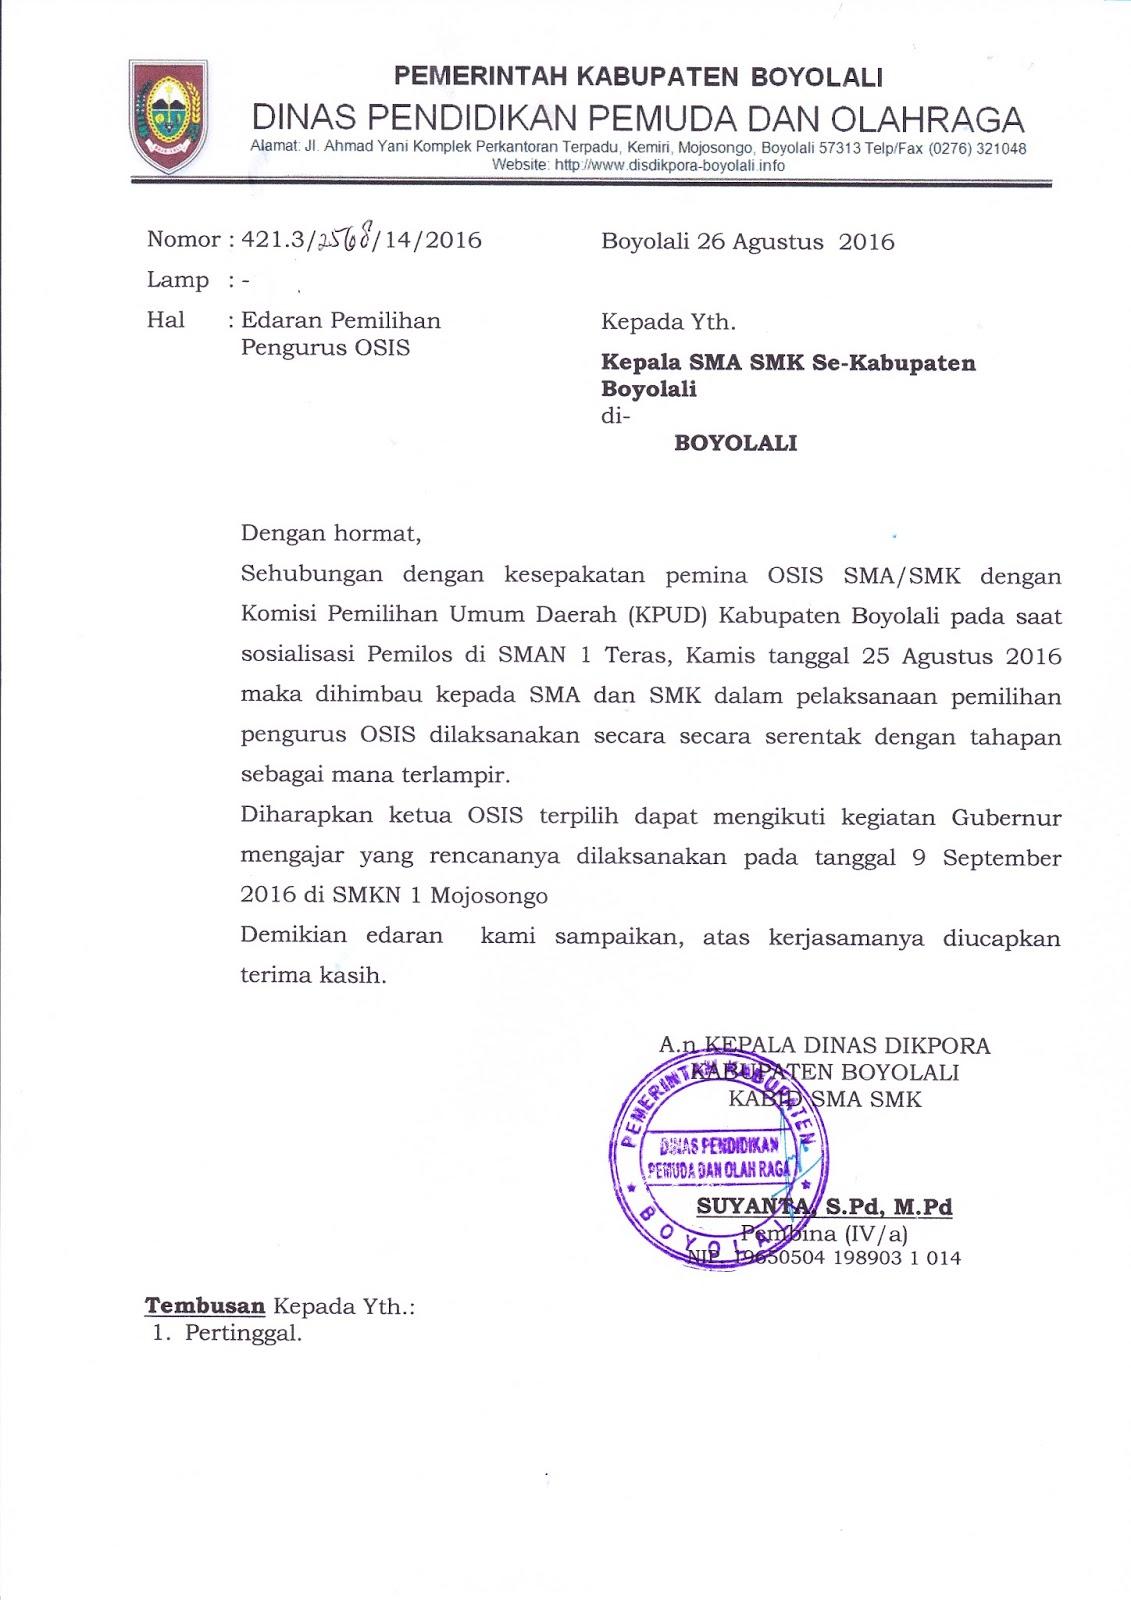 Info Sma Smk Kabupaten Boyolali Eadaran Pemilihan Pengurus Osis